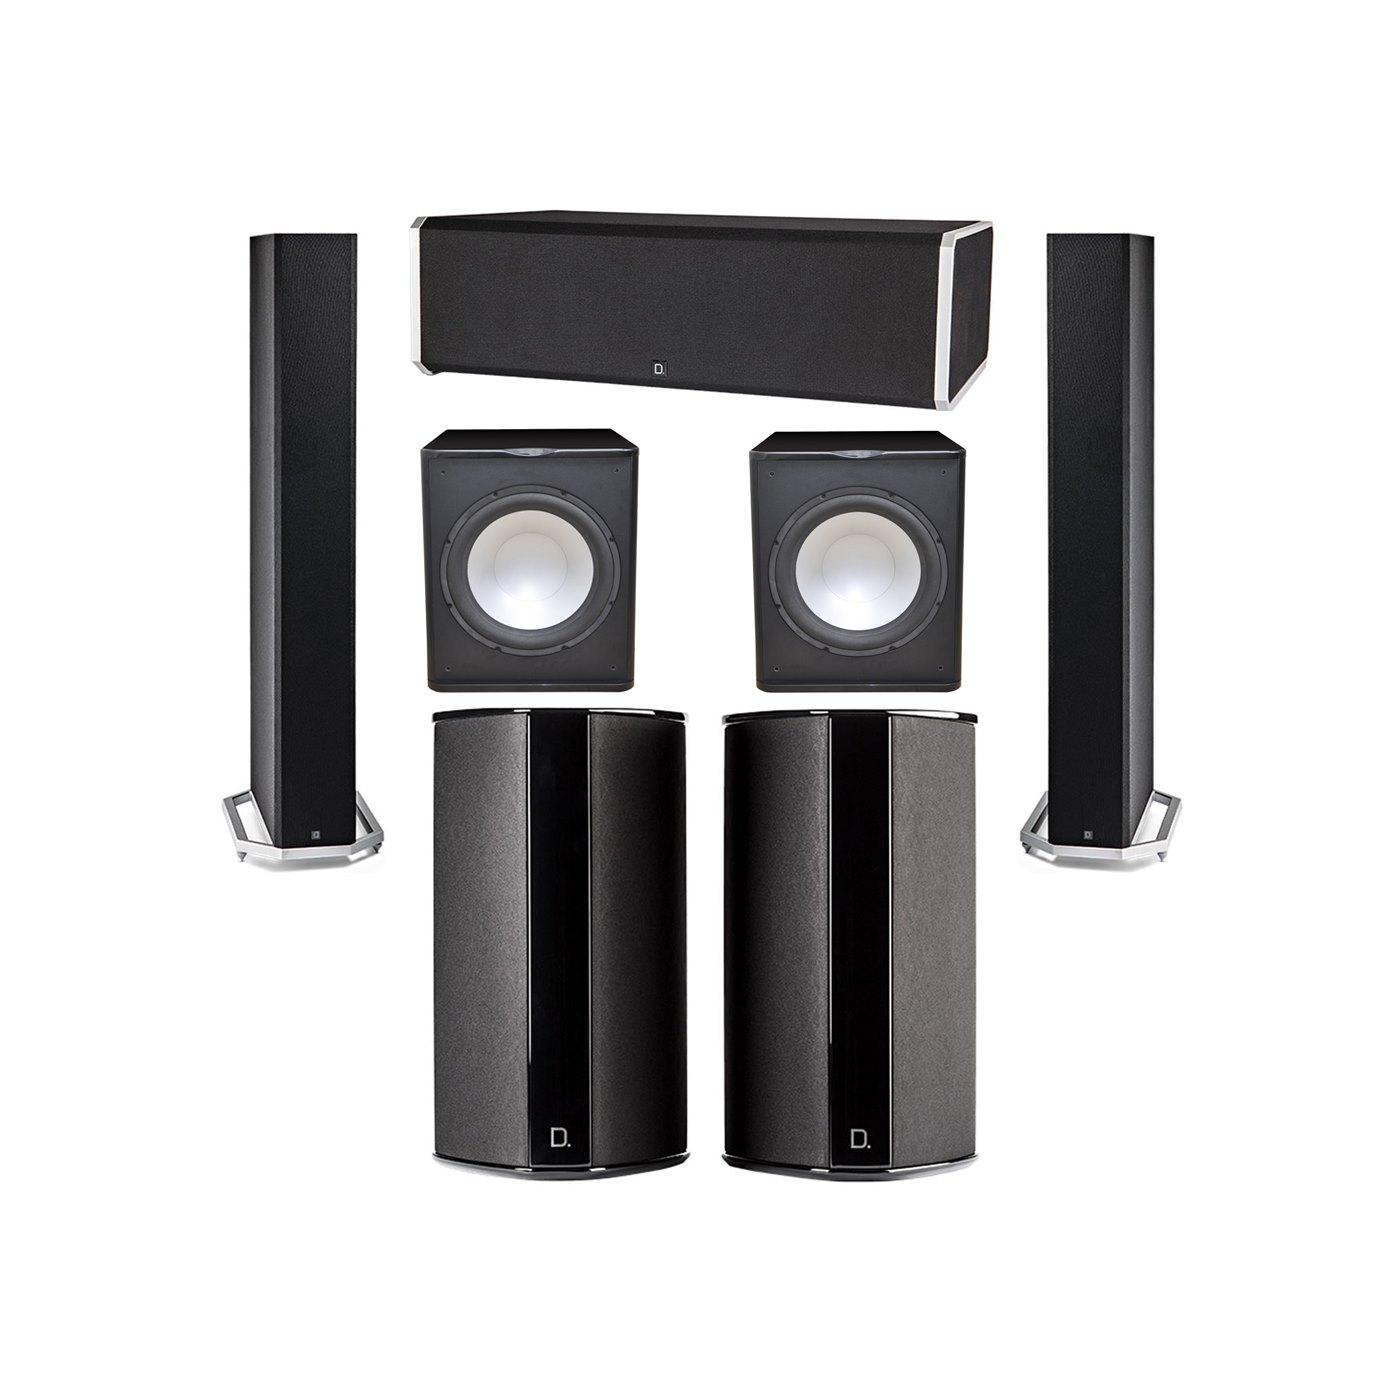 Definitive Technology 5.2 System with 2 BP9060 Tower Speakers, 1 CS9080 Center Channel Speaker, 2 SR9080 Surround Speaker, 2 Premier Acoustic PA-150 Subwoofer